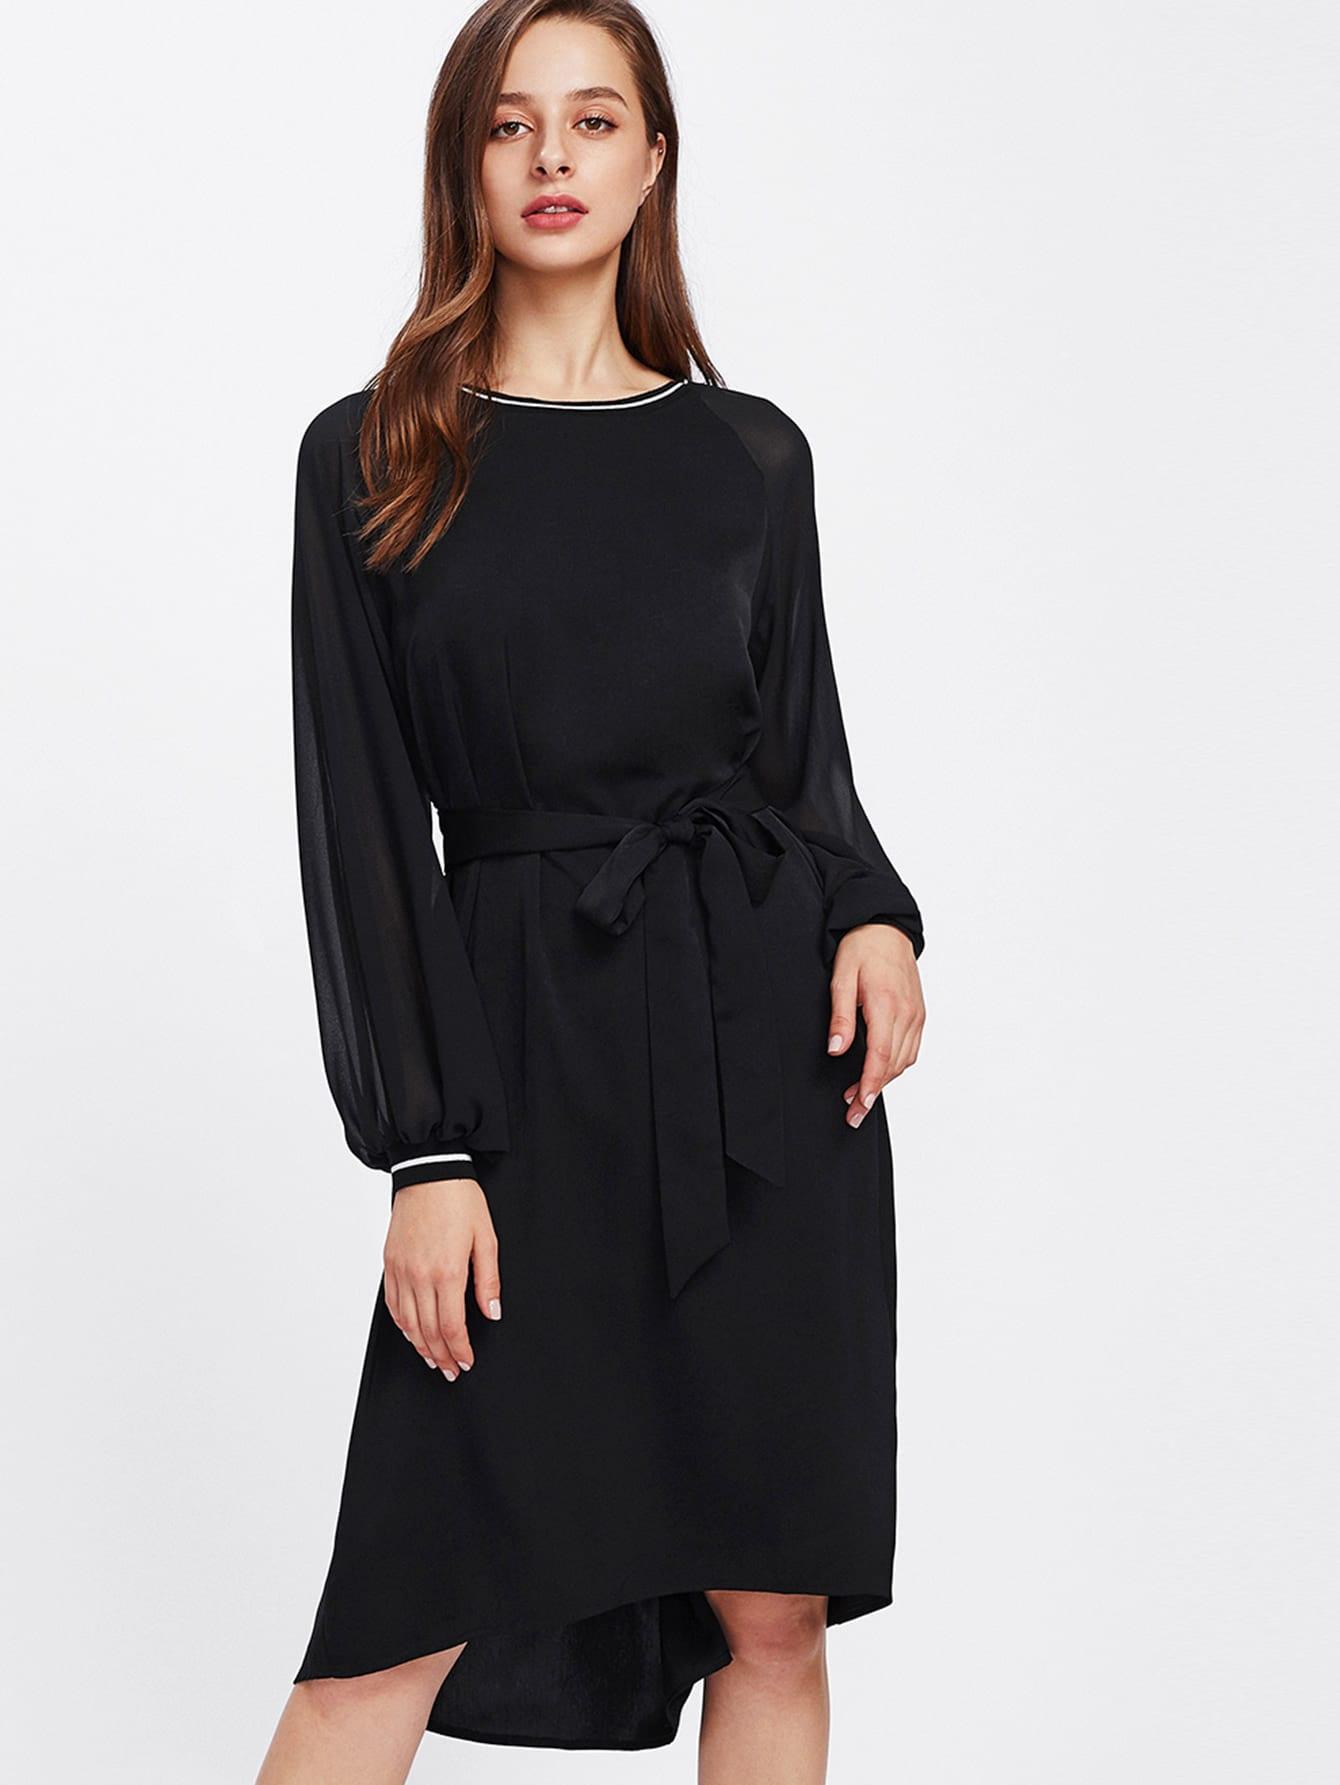 Lantern Sleeve Striped Trim Dip Hem Dress lantern sleeve ruffle trim pinstripe dress